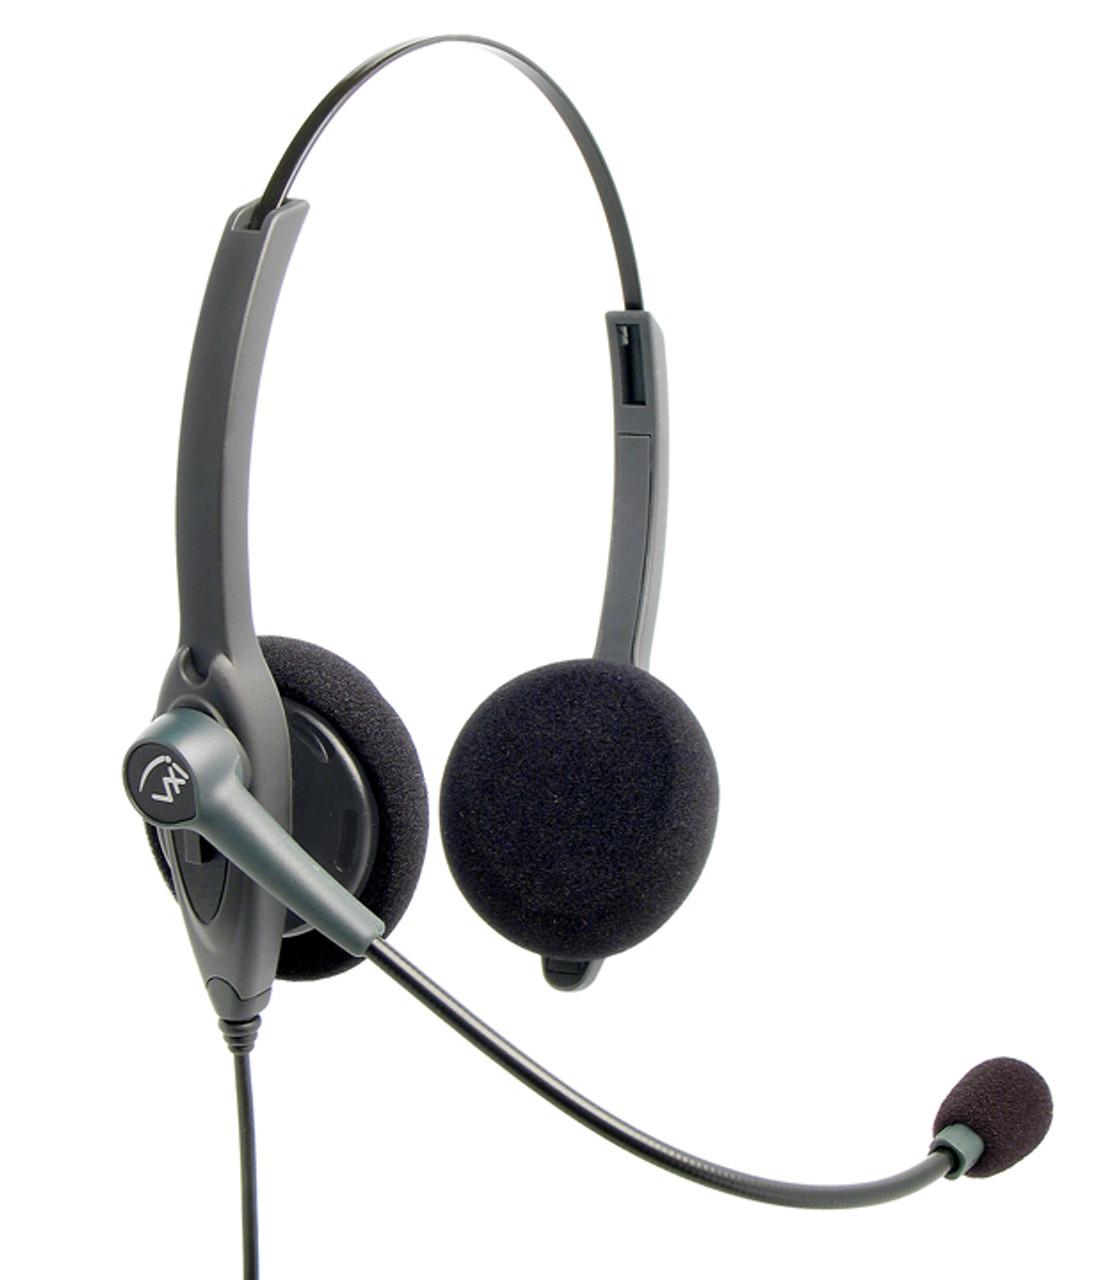 Vxi Passport 21v Mono Telephone Headset Vxi 202768 For Office Phones Avaya Nortel Cisco Nec Mitel Comdial And Many More